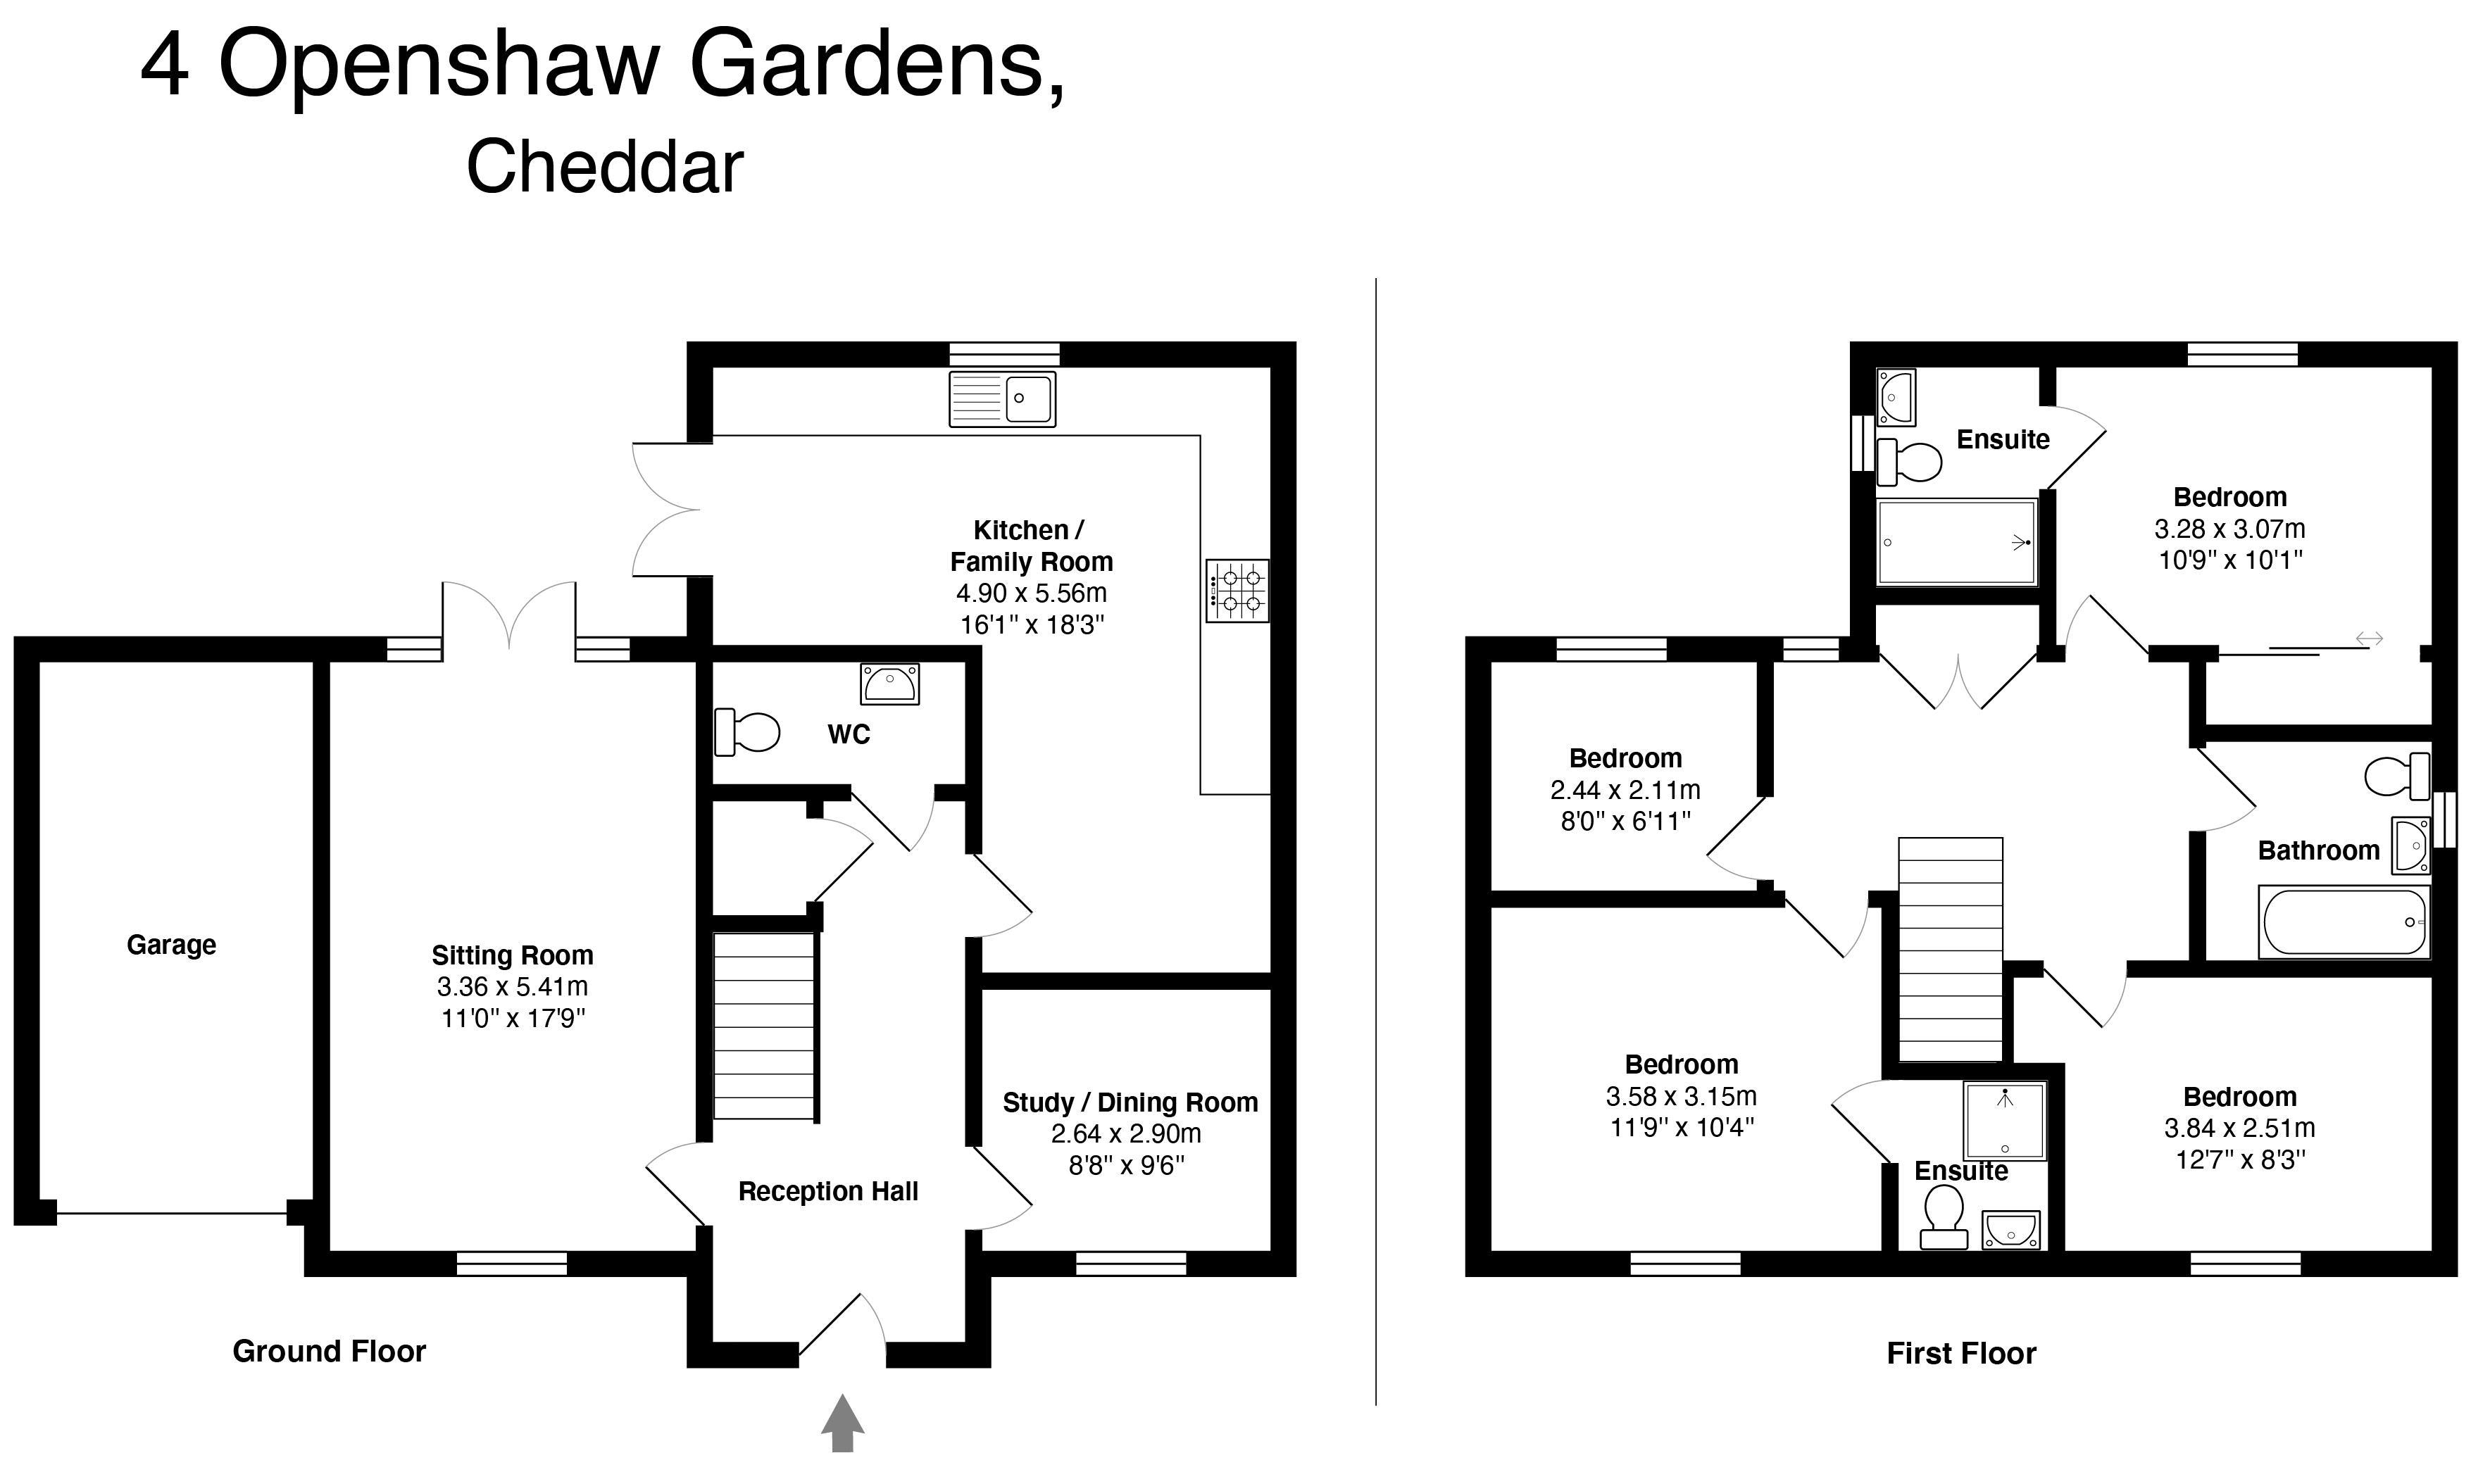 Openshaw Gardens